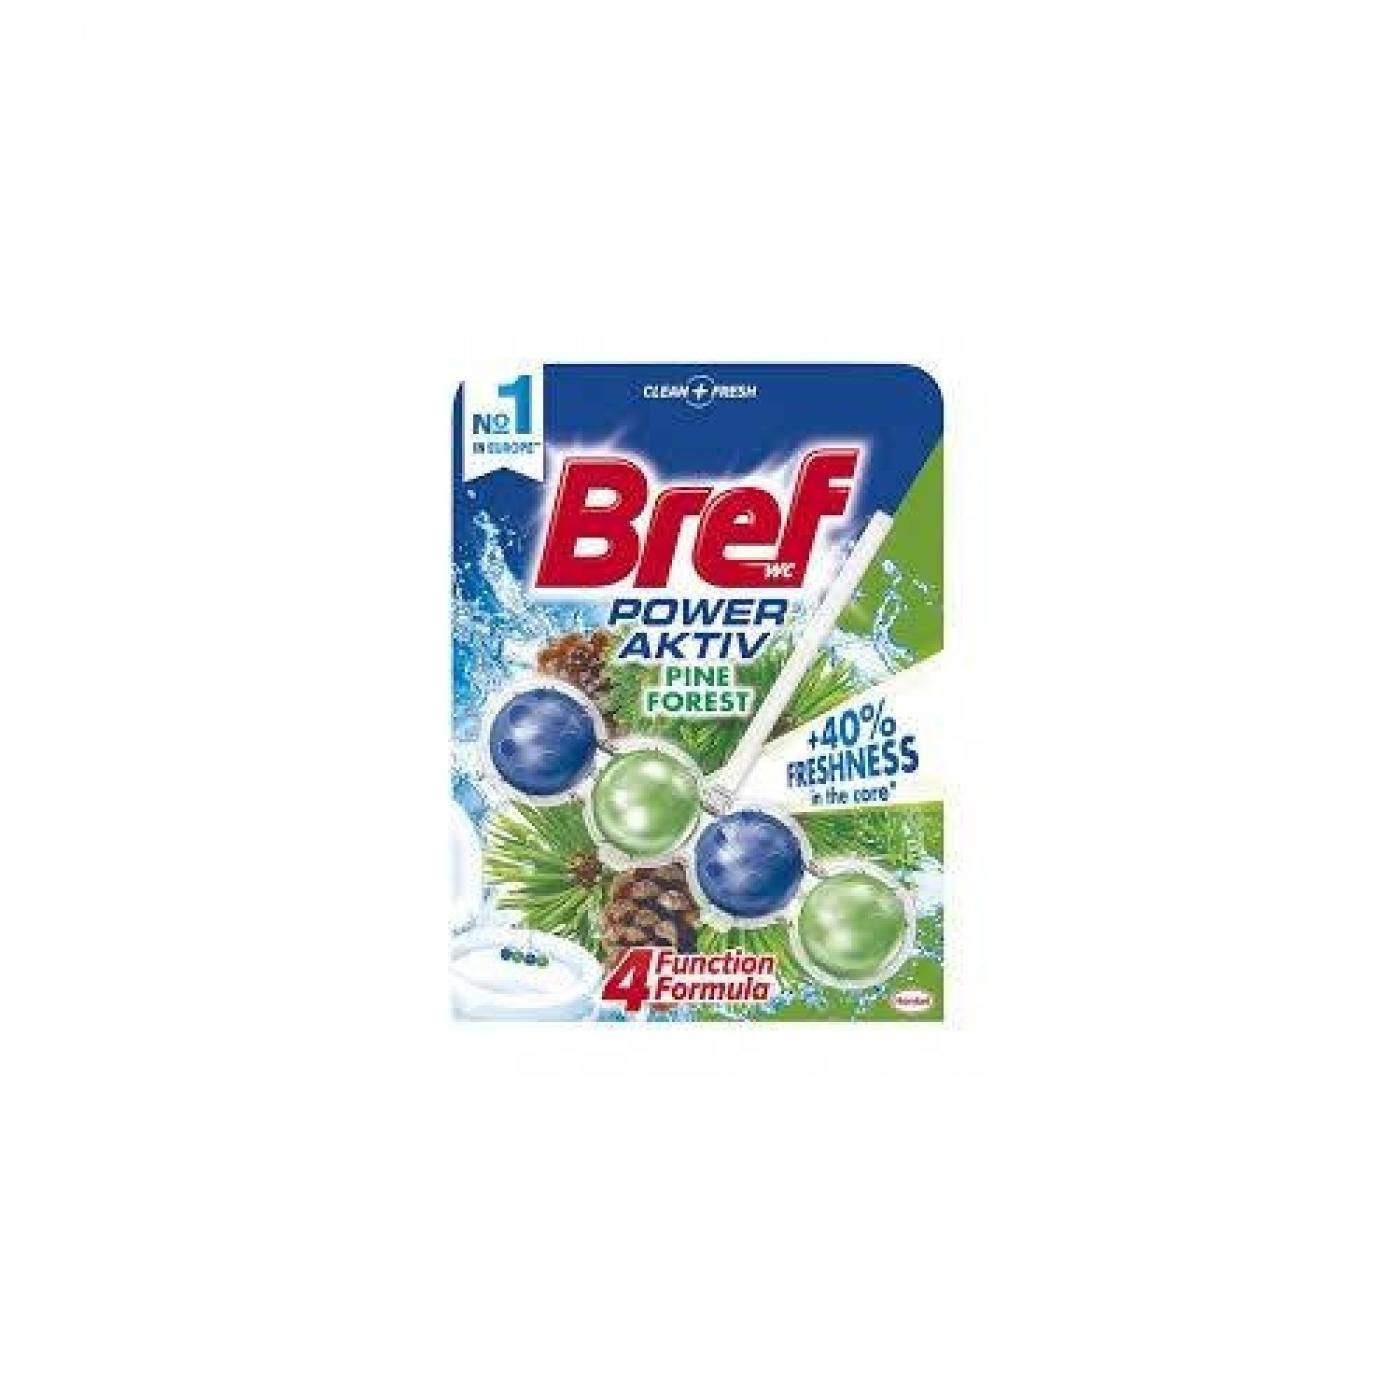 BREF POWER (TEKLİ) AKTİF TOPLAR 50GR ÇAM